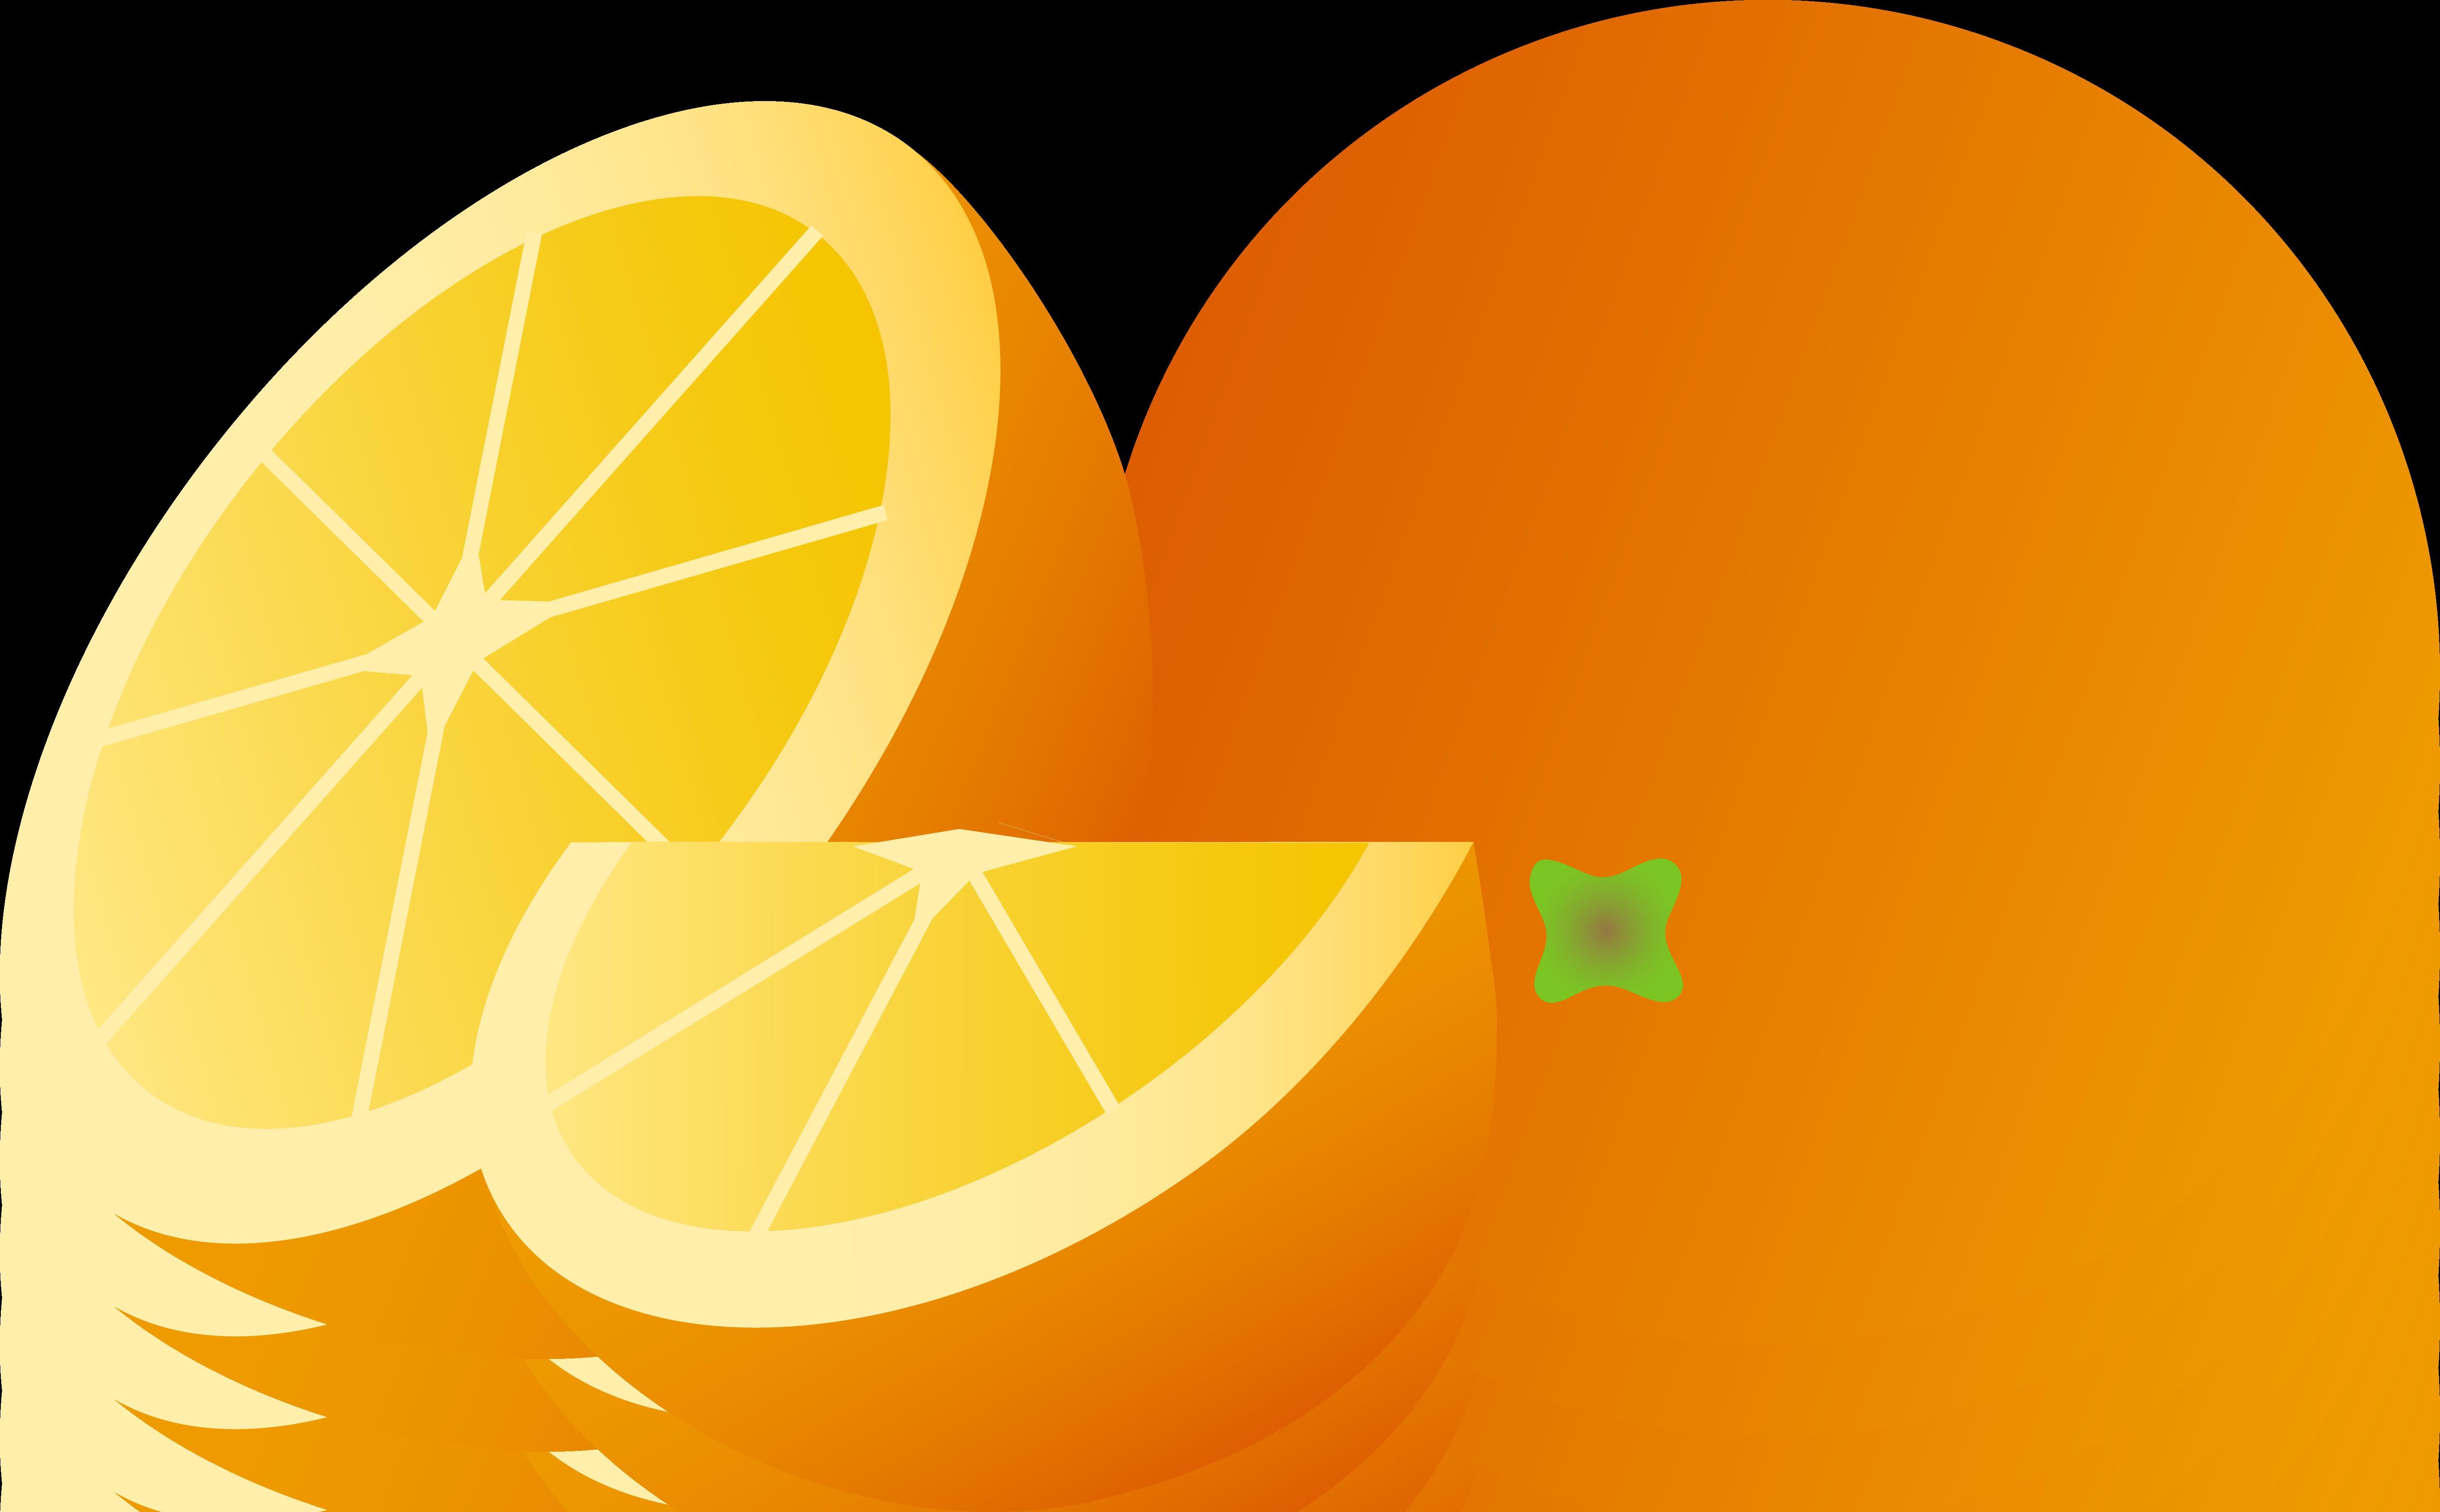 Orange Whole Half and Wedge - Free Clip Art